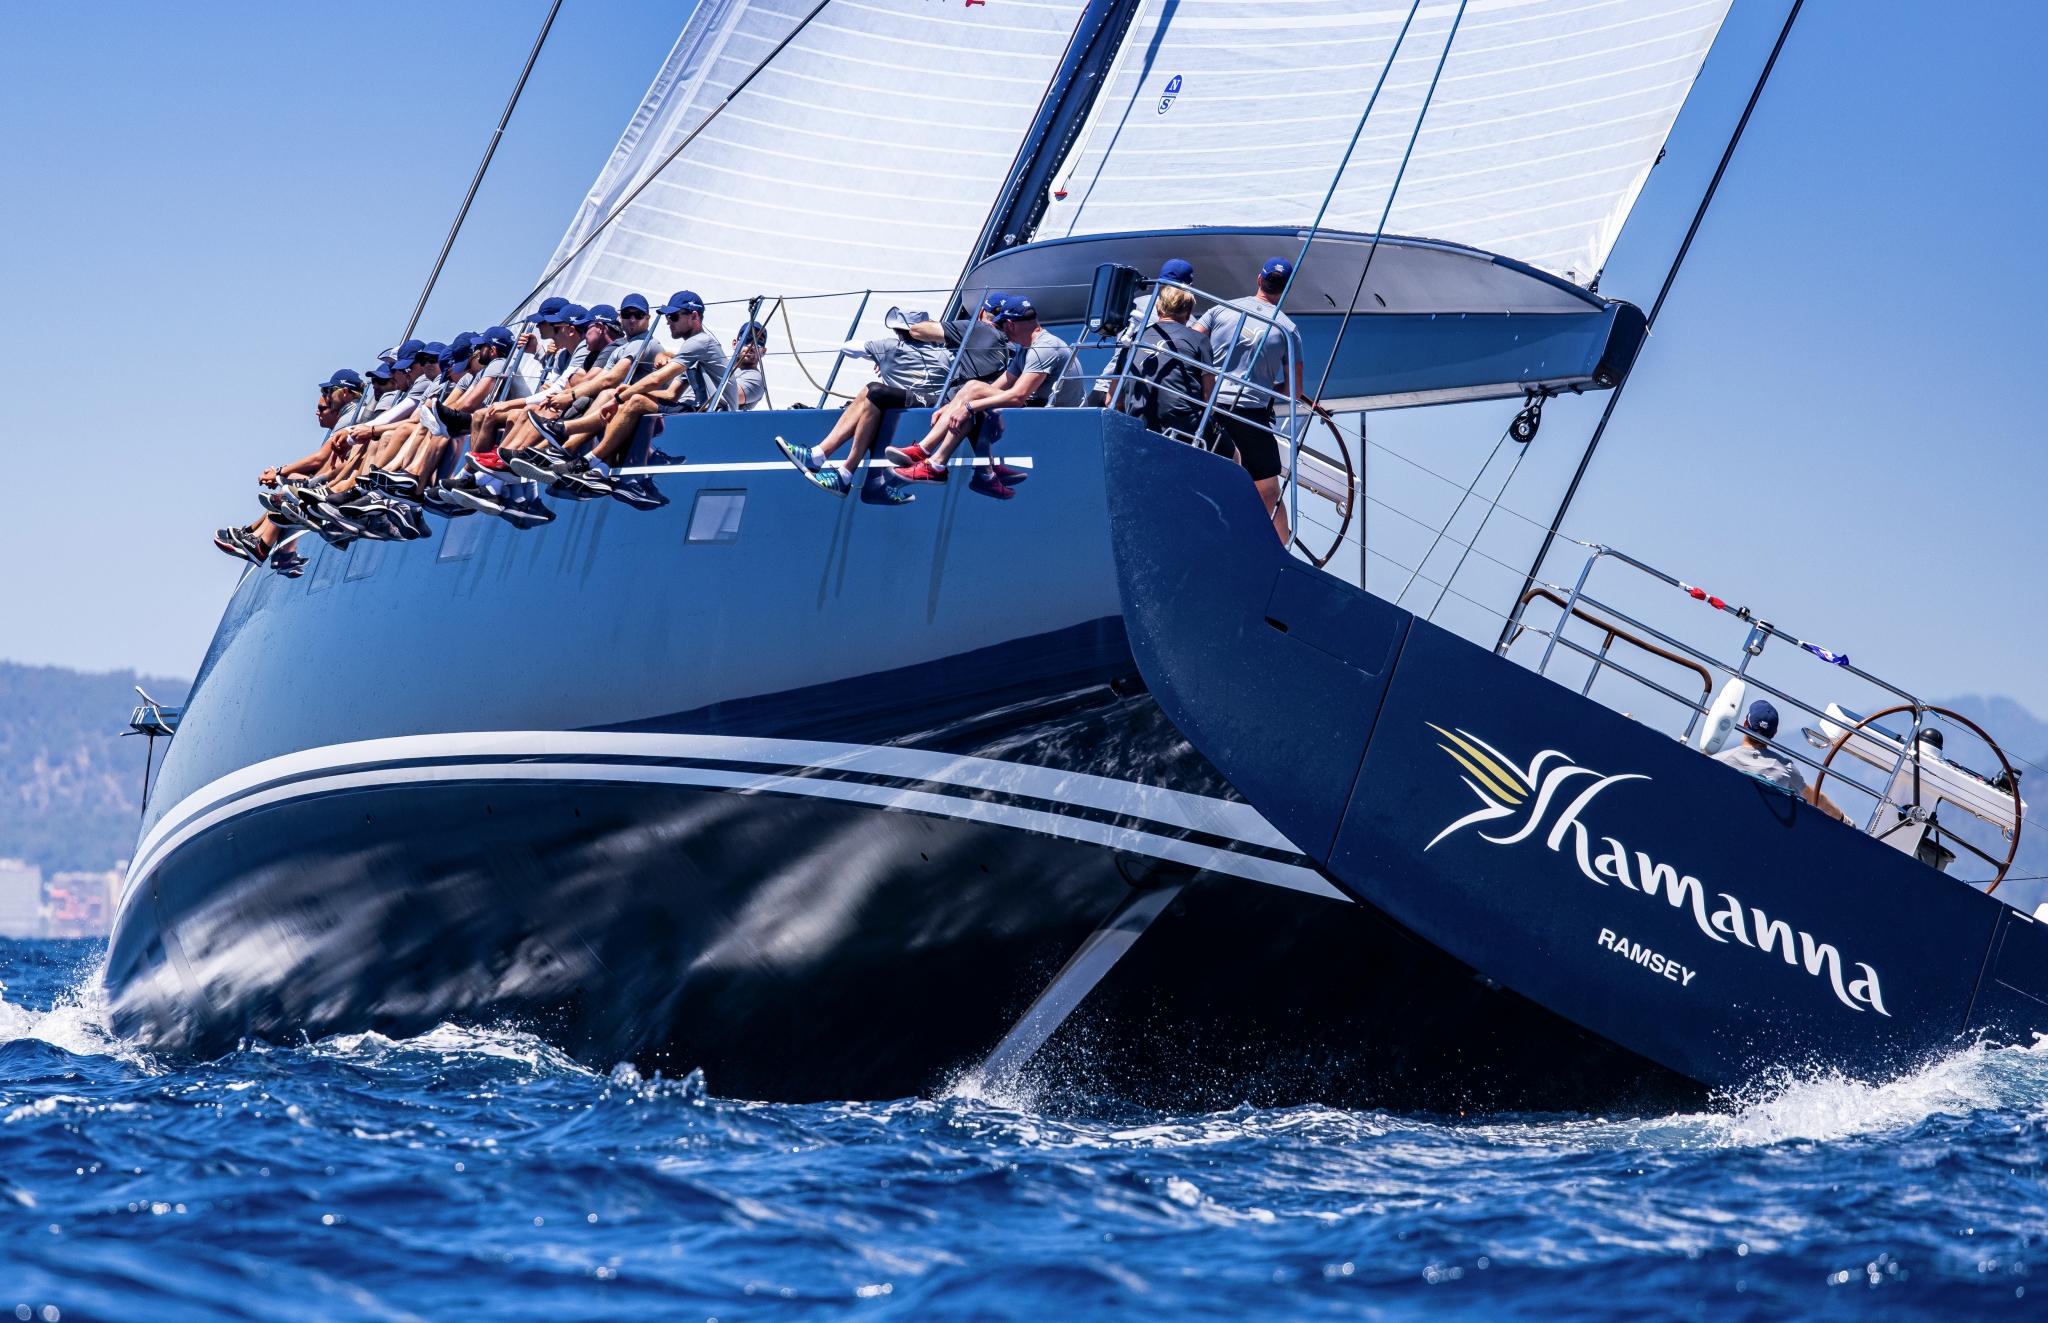 Superyacht Cup Palma 2021, 'Shamanna' - the 35m Frers designed Nautor Swan